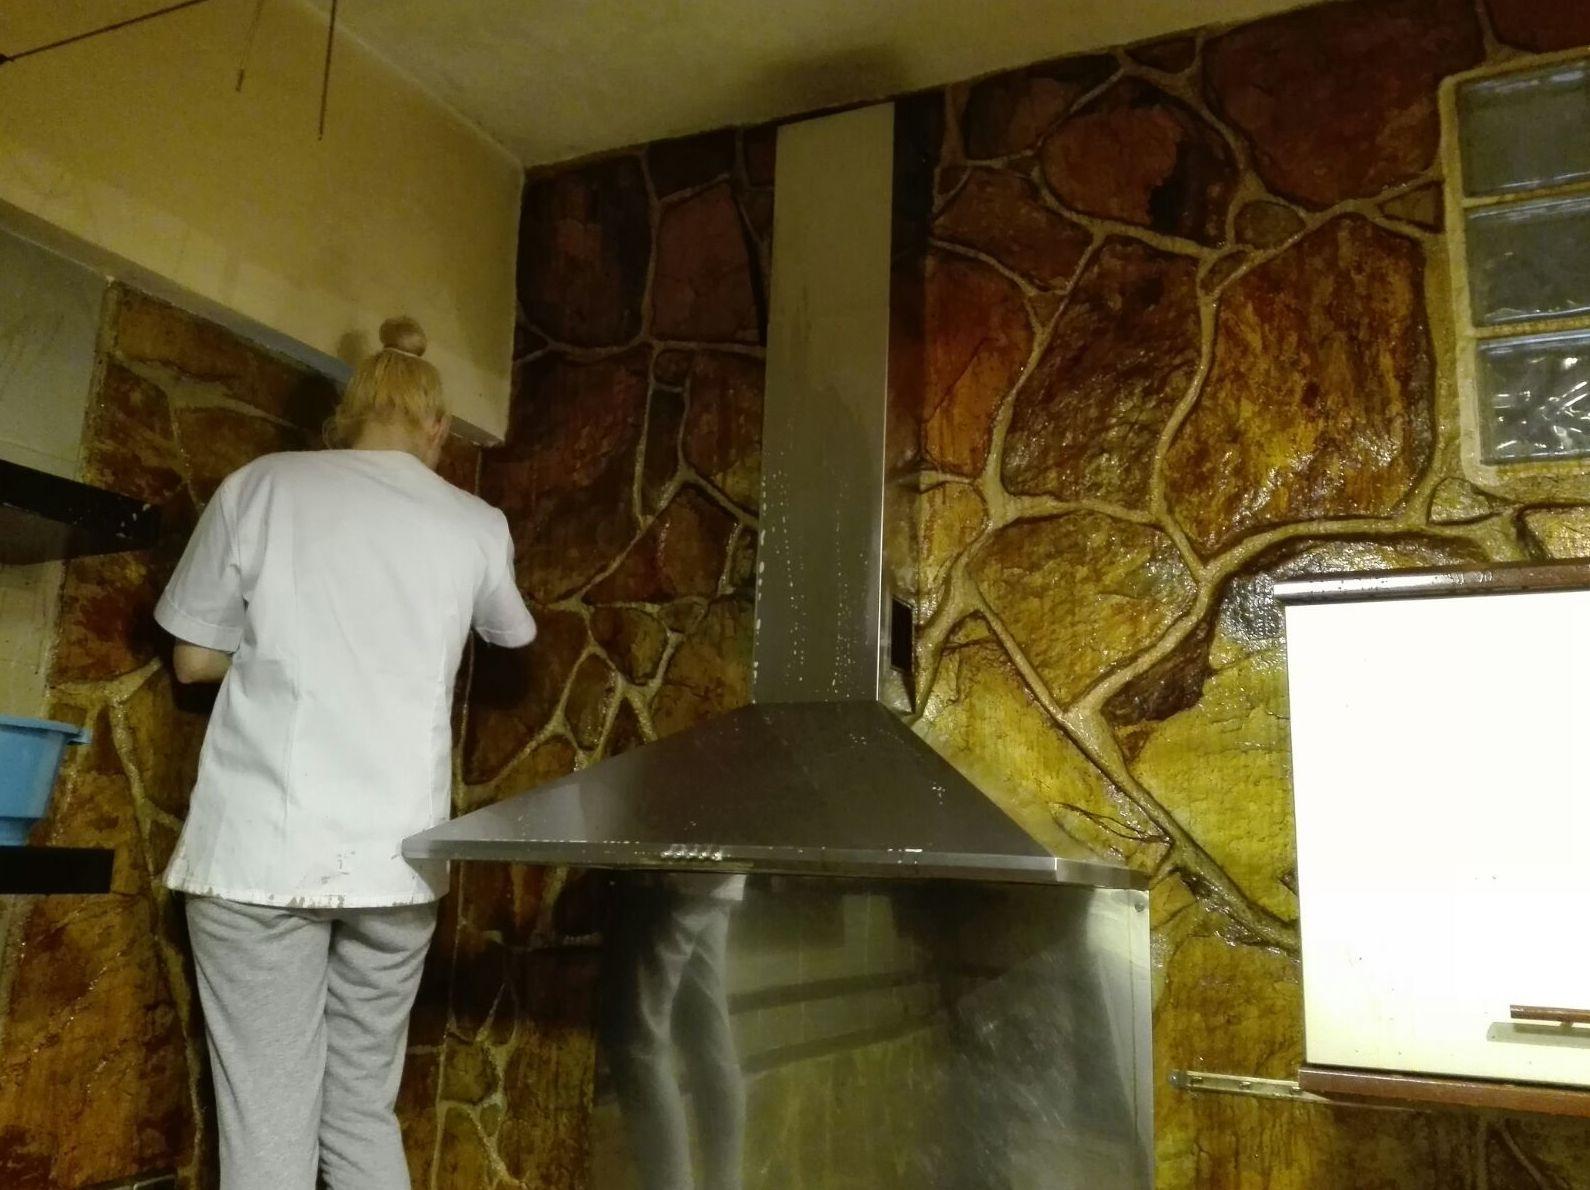 Foto 4 de Empresas de limpieza en BASOZABAL | Limpiezas La Fragua